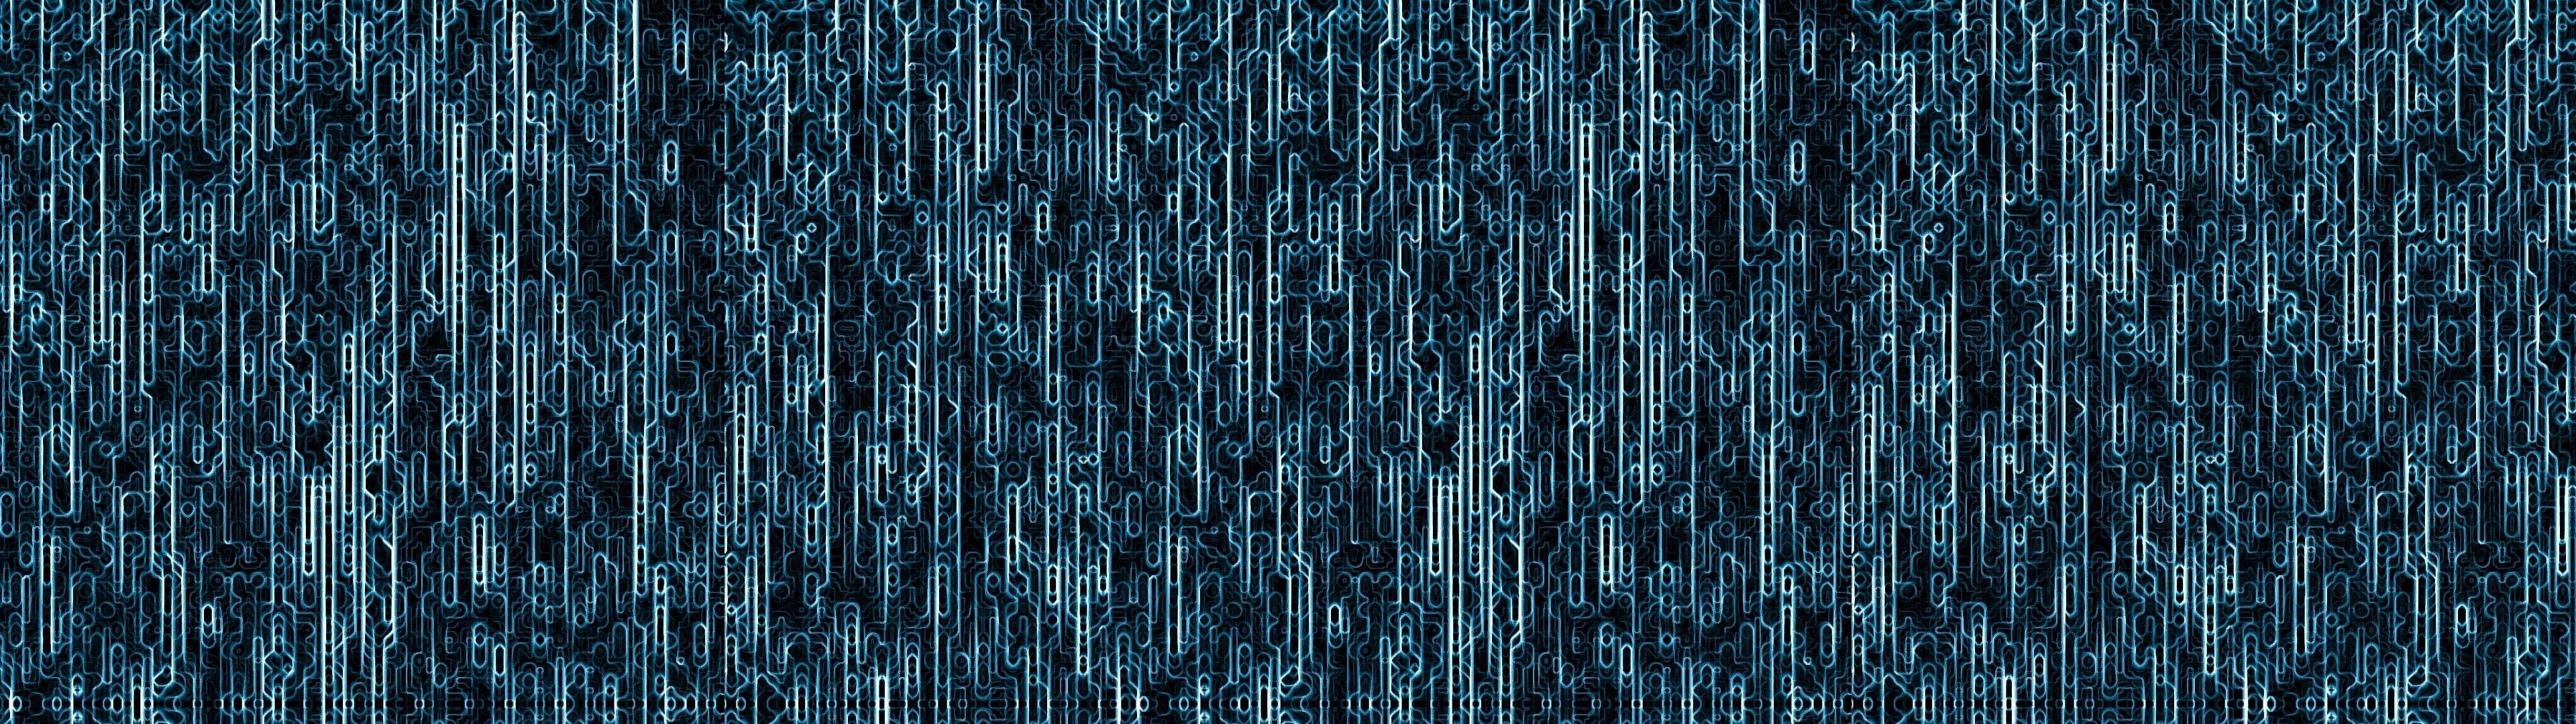 WallpaperFusion-untitled-45-Original-3840X1080.jpg